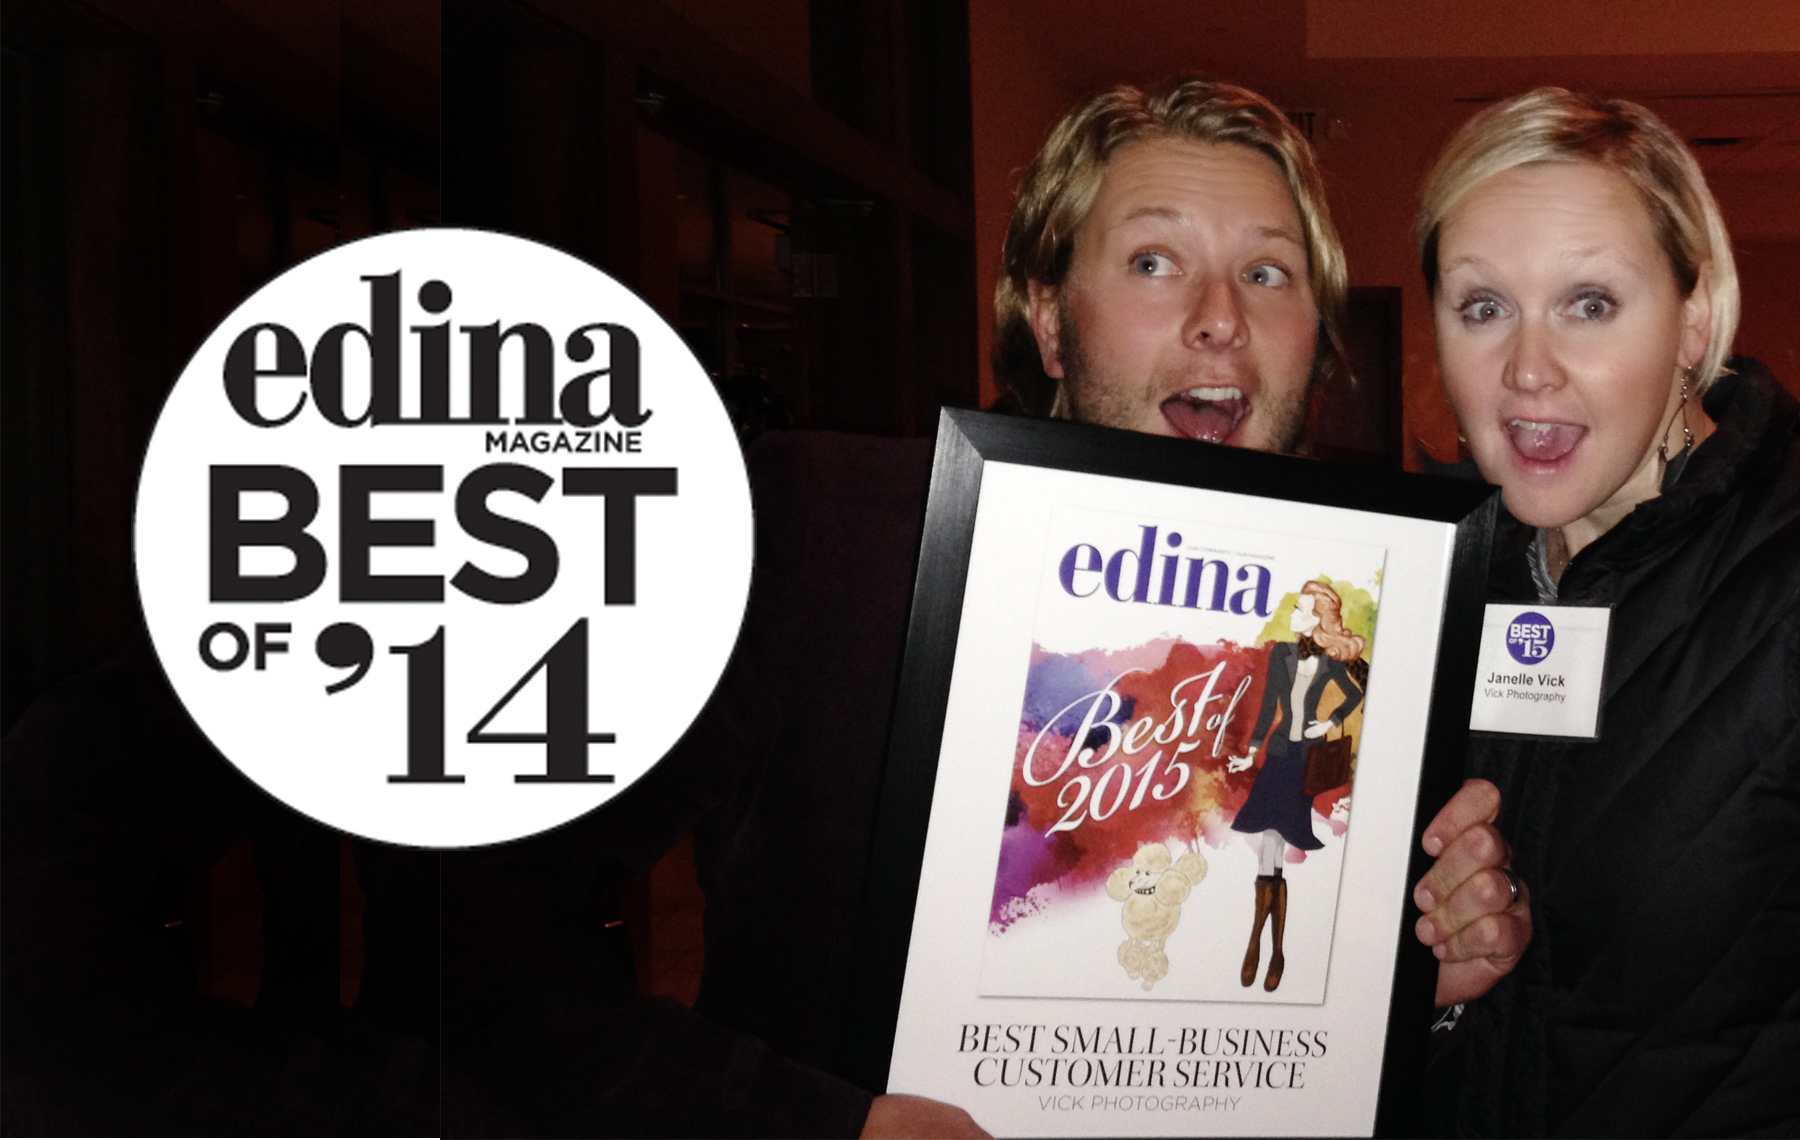 Edina-Magazine-Best-2015.jpg